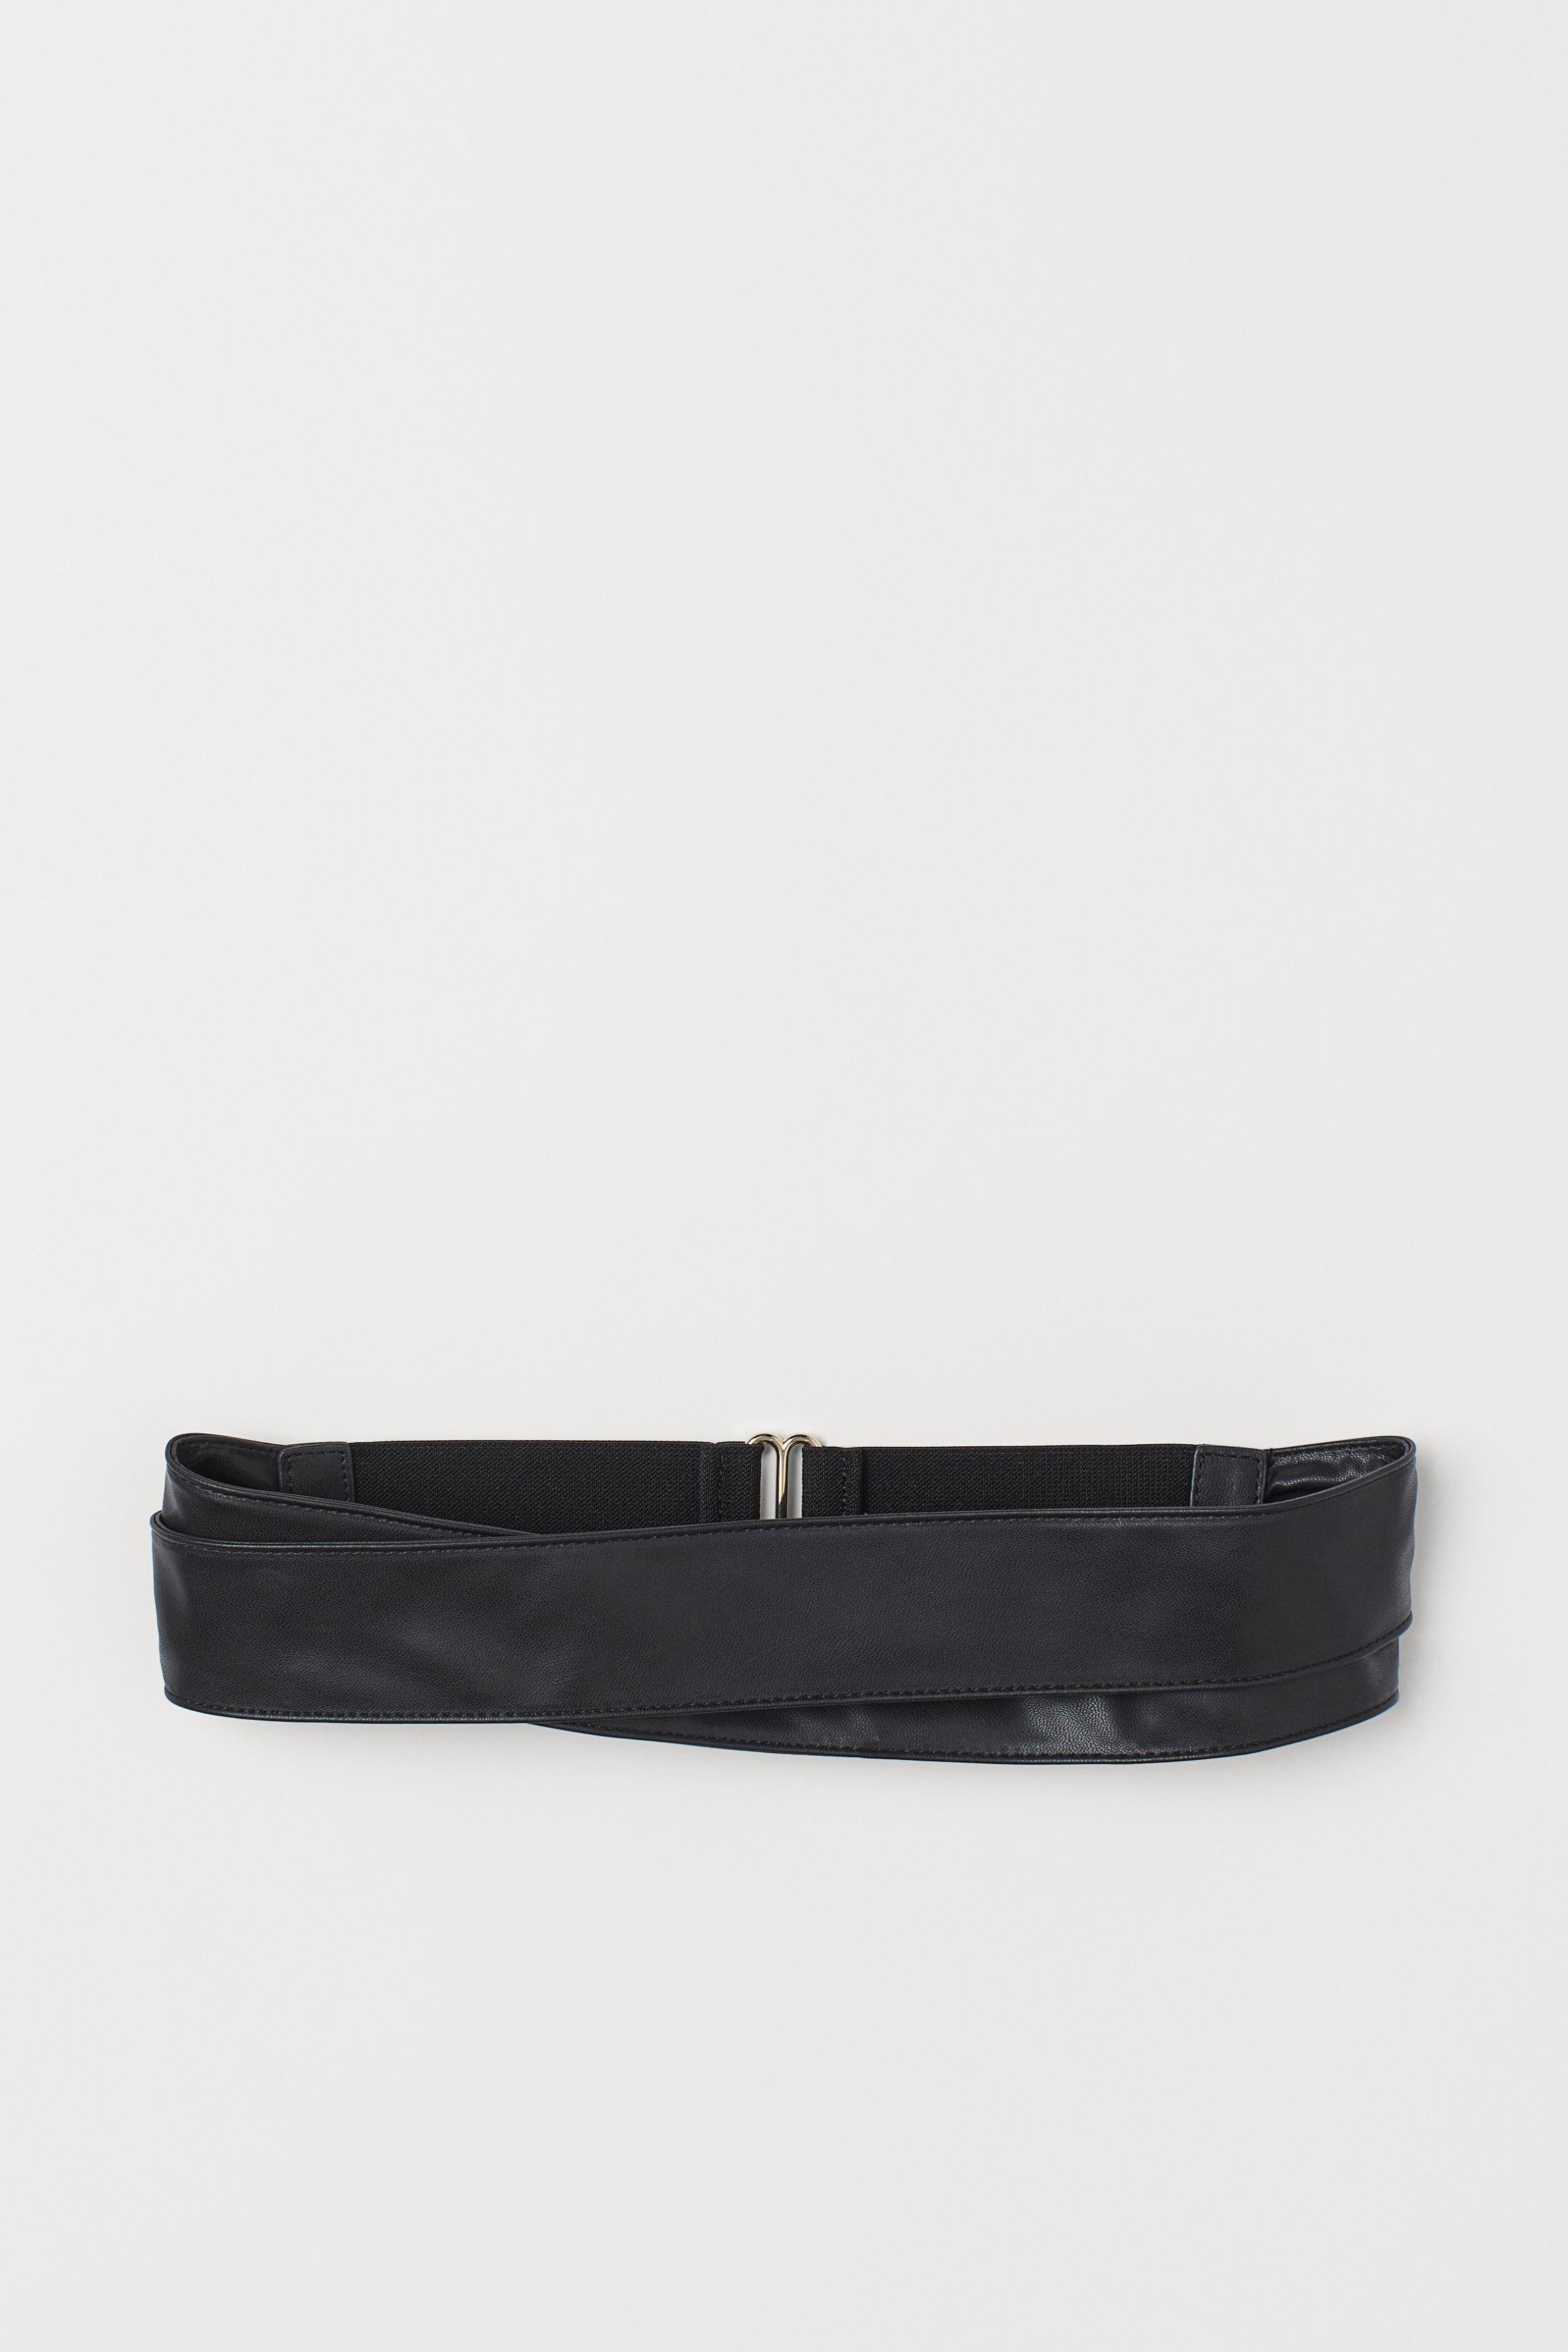 Wrapover Waist Belt